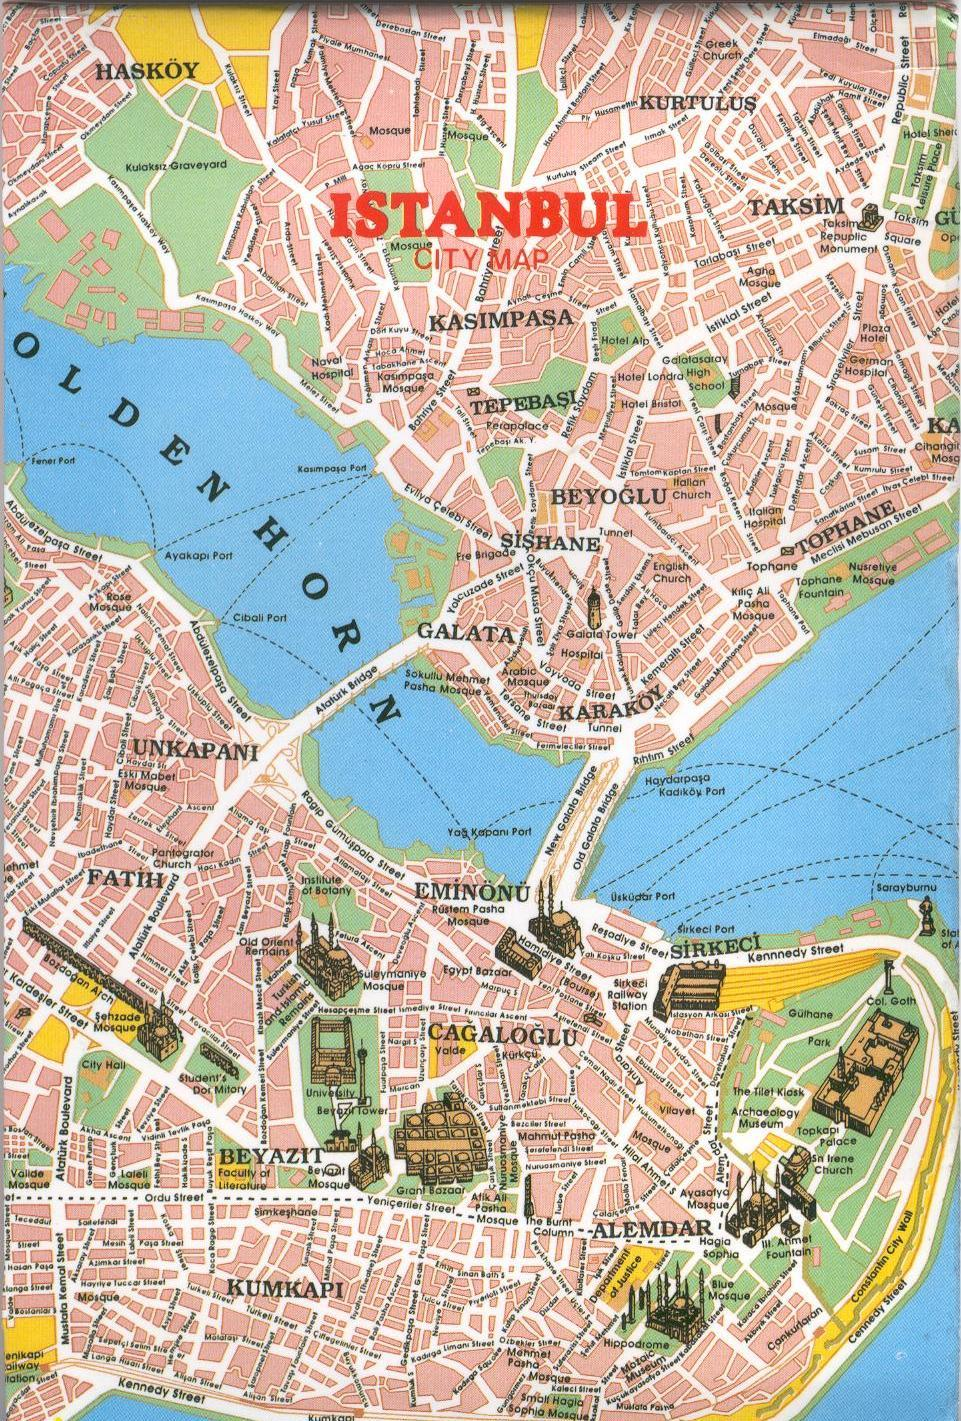 Mapa Monumentos Istambul, Turquia 3